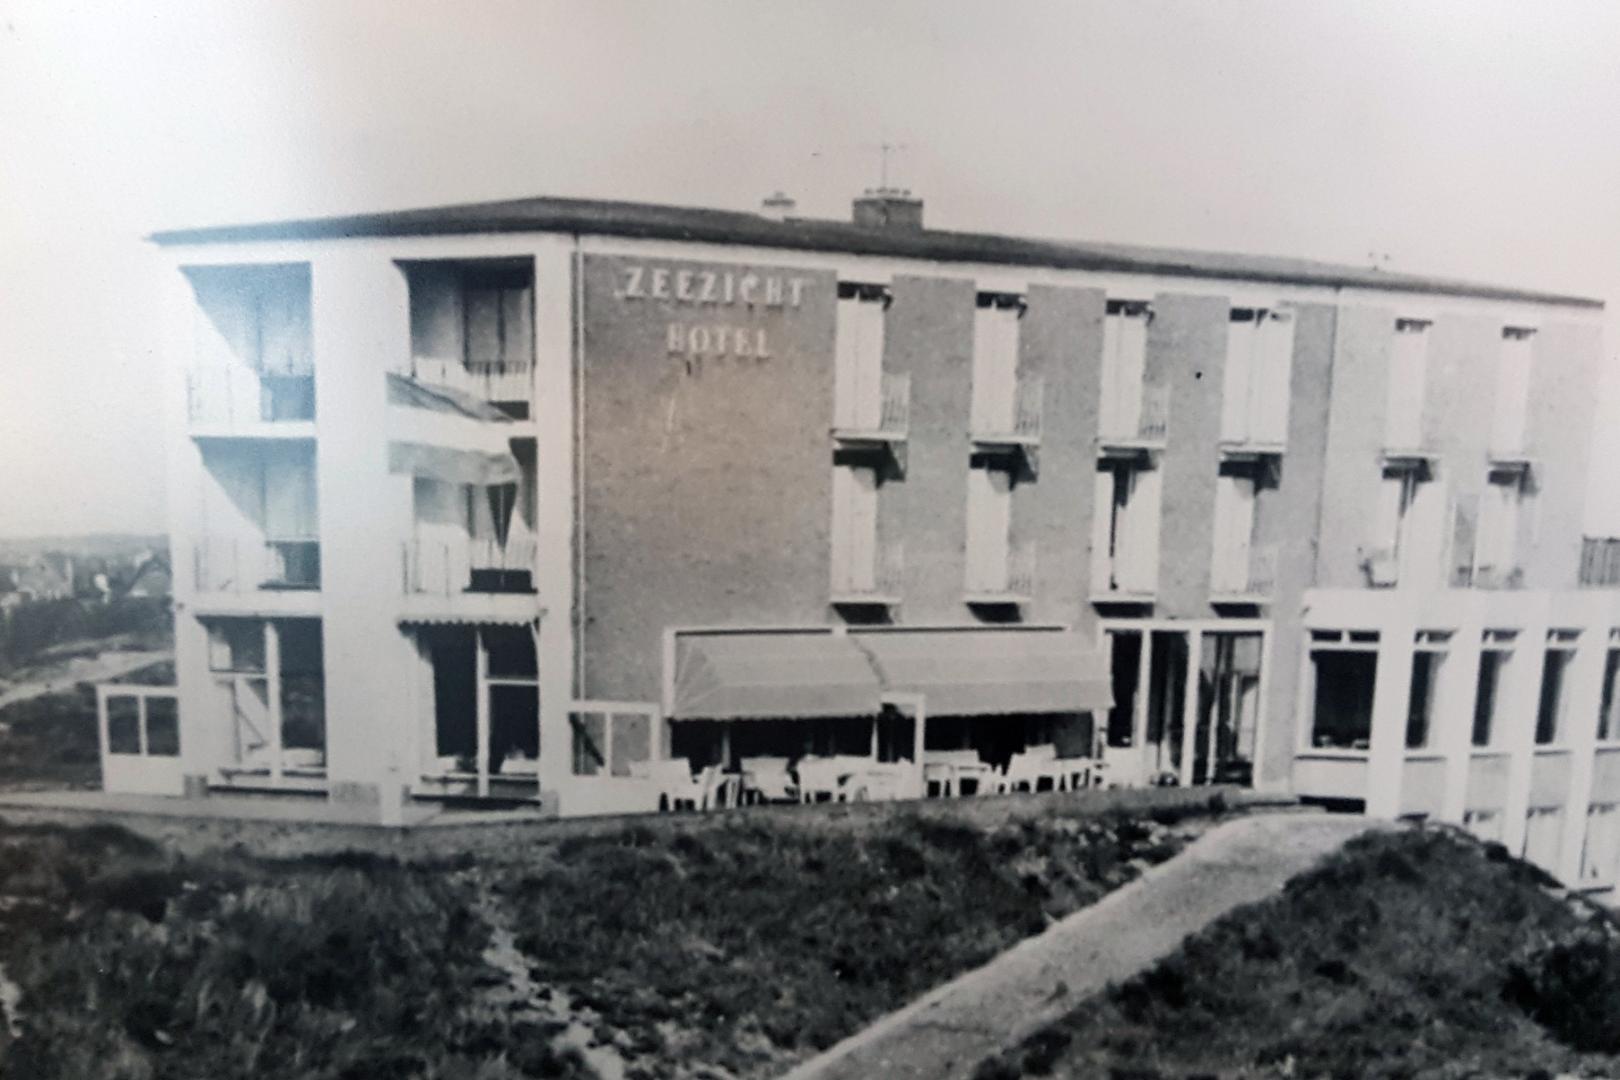 Zeezicht Hotel